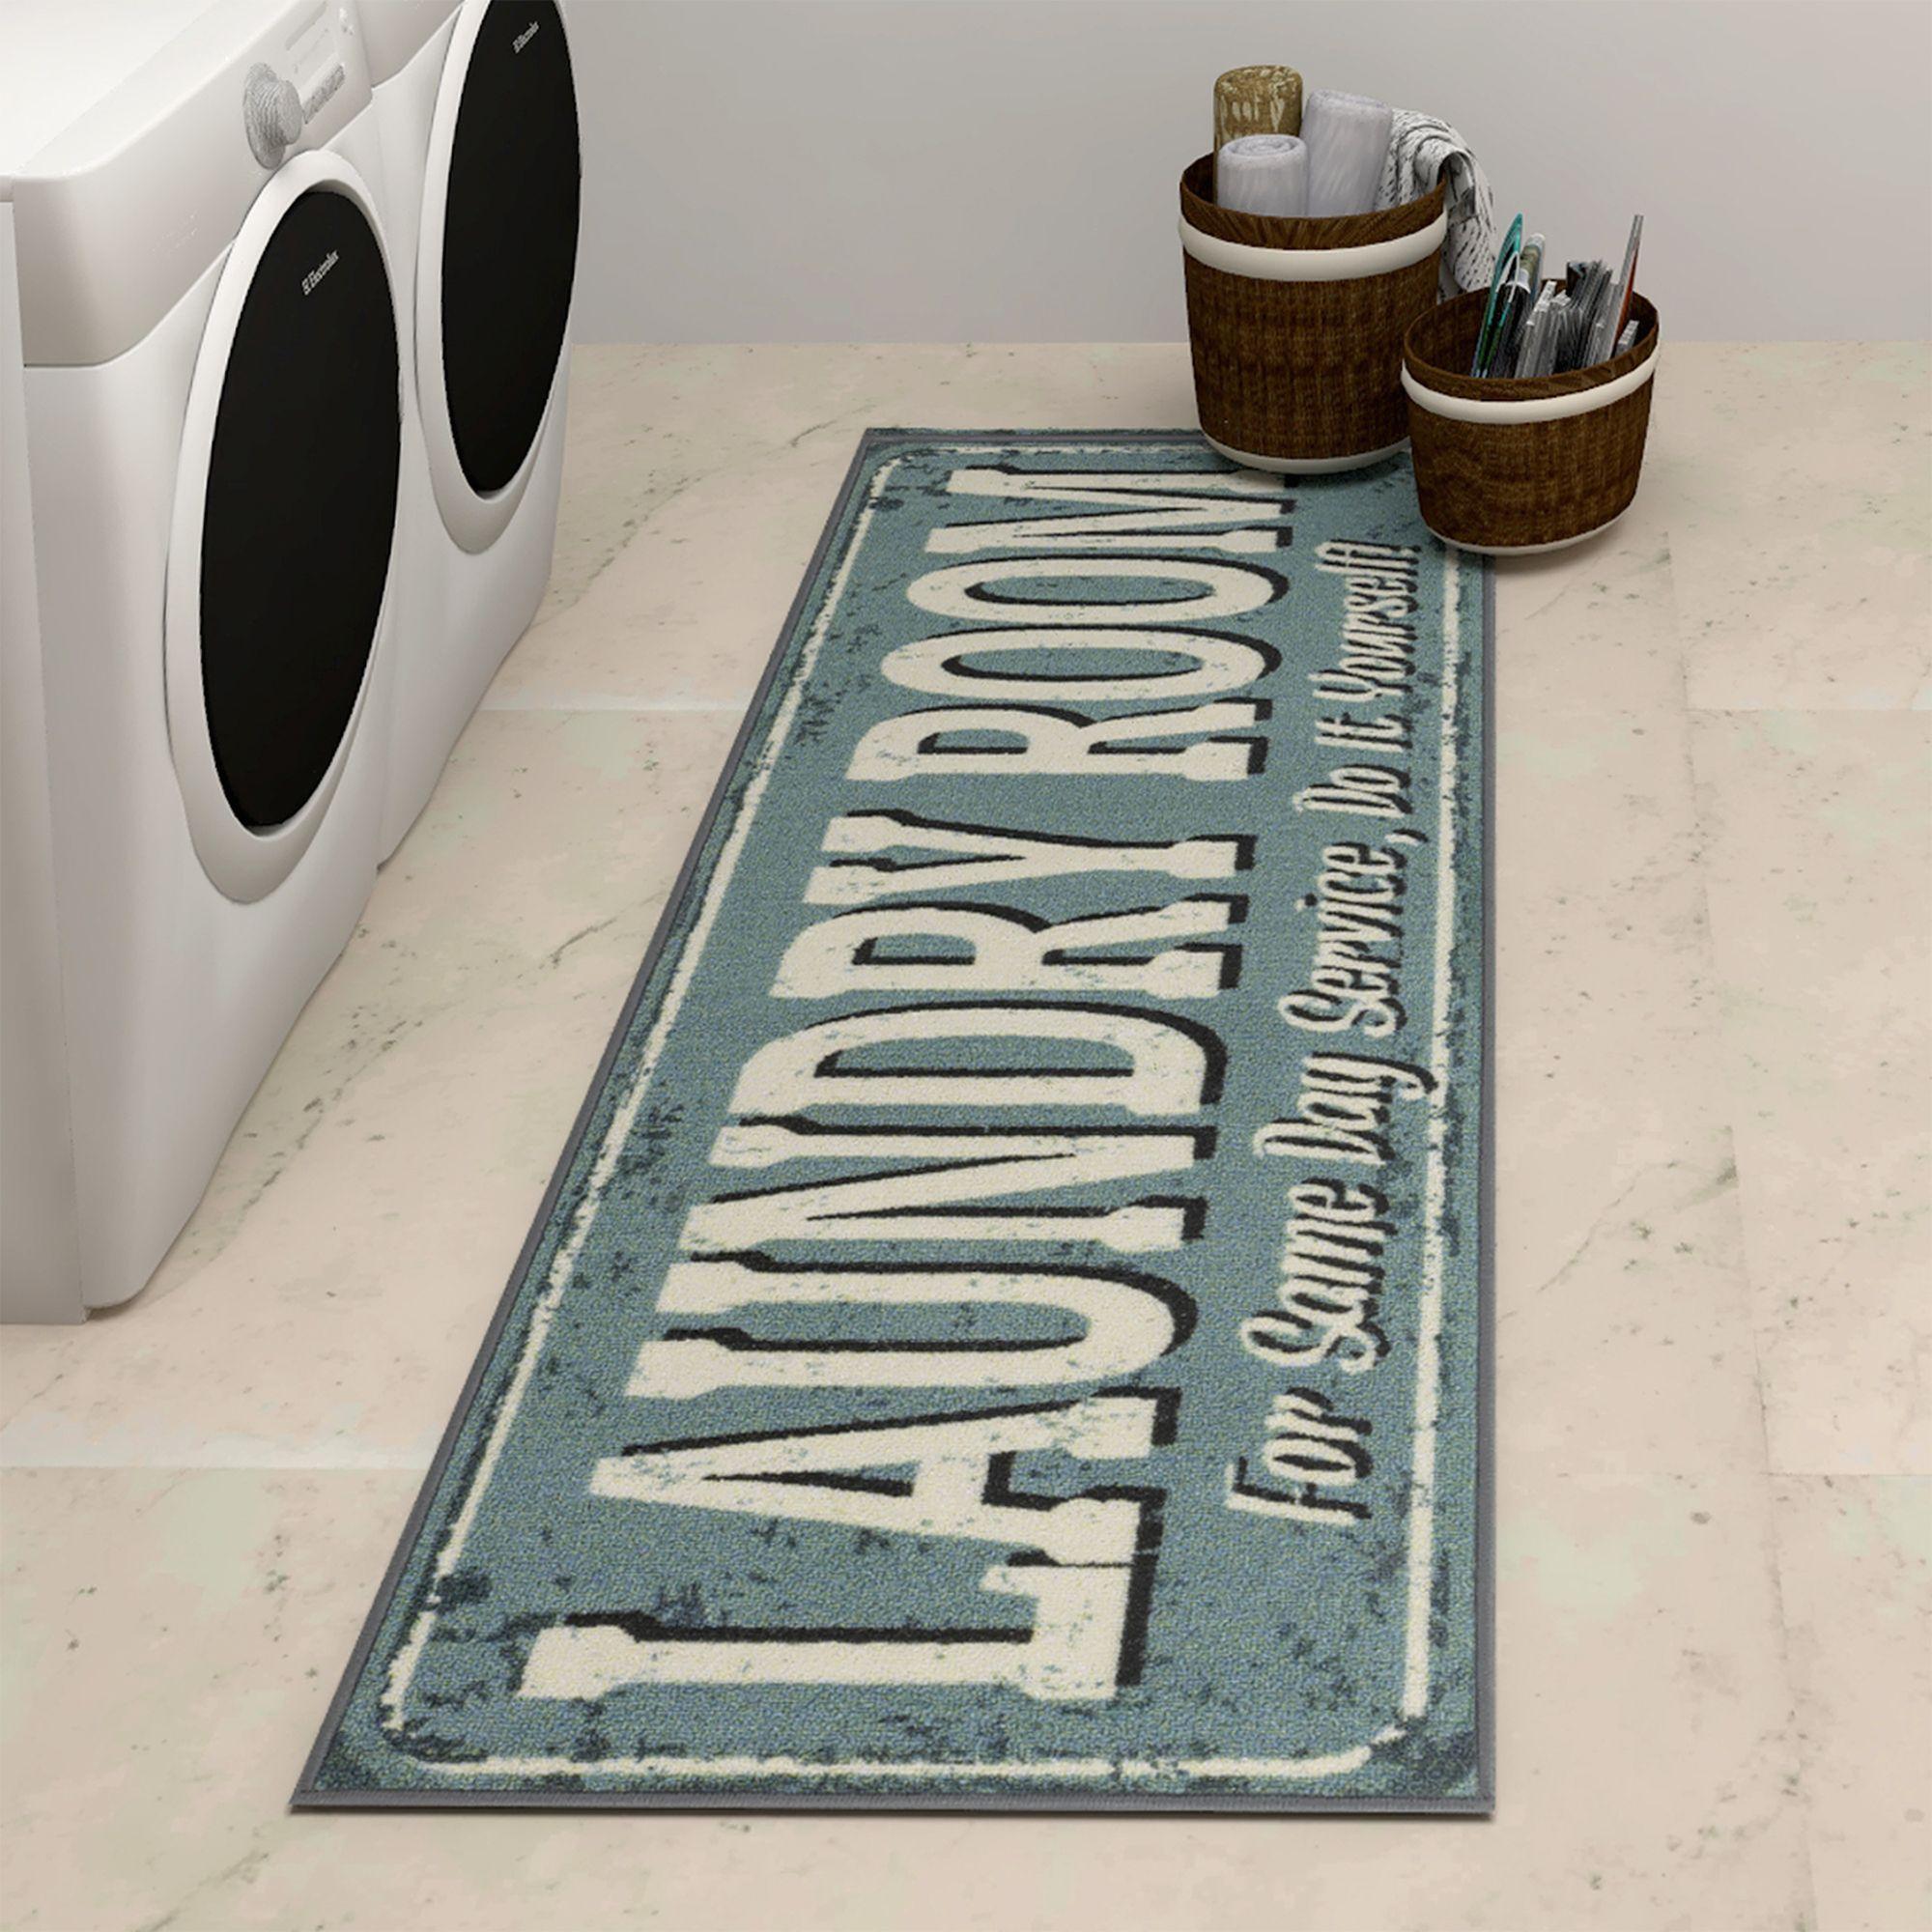 Ottomanson Laundry Mat Runner Rug Teal 20 X59 Walmart Com In 2020 Laundry Mat Laundry Room Rugs Rug Runner